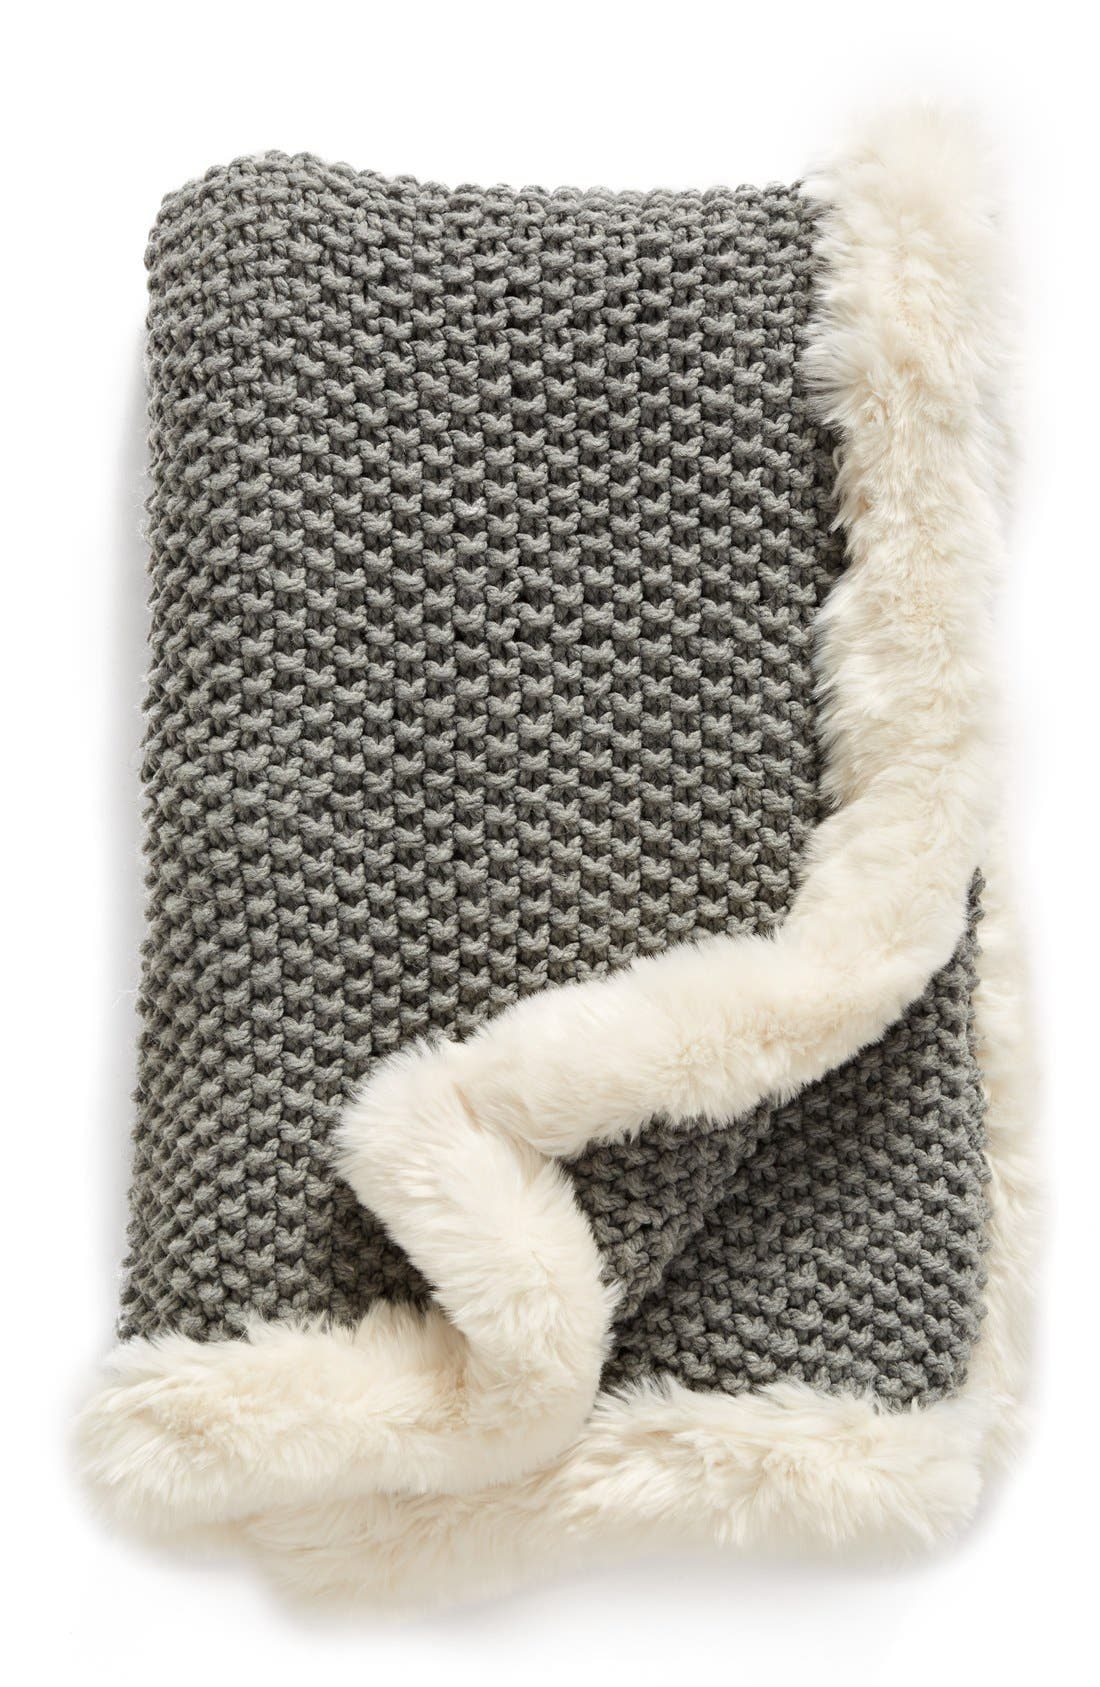 NORDSTROM AT HOME, Faux Fur Border Knit Throw, Main thumbnail 1, color, 020